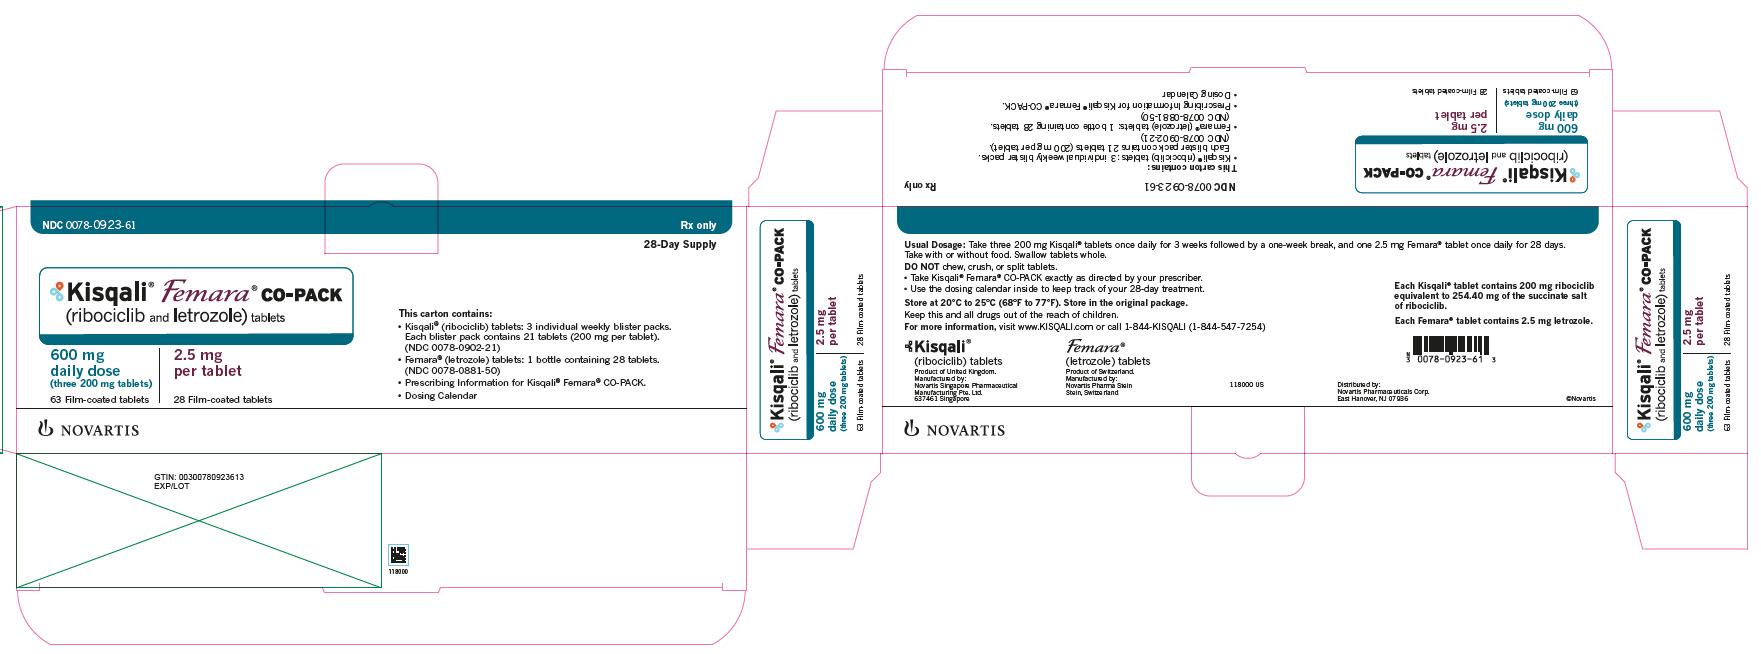 PRINCIPAL DISPLAY PANEL Kisqali Femara CO-PACK (ribociclib and letrozole) tablets 600 mg daily dose (three 200 mg tablets) 63 Film-coated tablets 2.5 mg per tablet 28 Film-coated tablets 28-Day Supply NDC: <a href=/NDC/0078-0923-61>0078-0923-61</a> Rx only